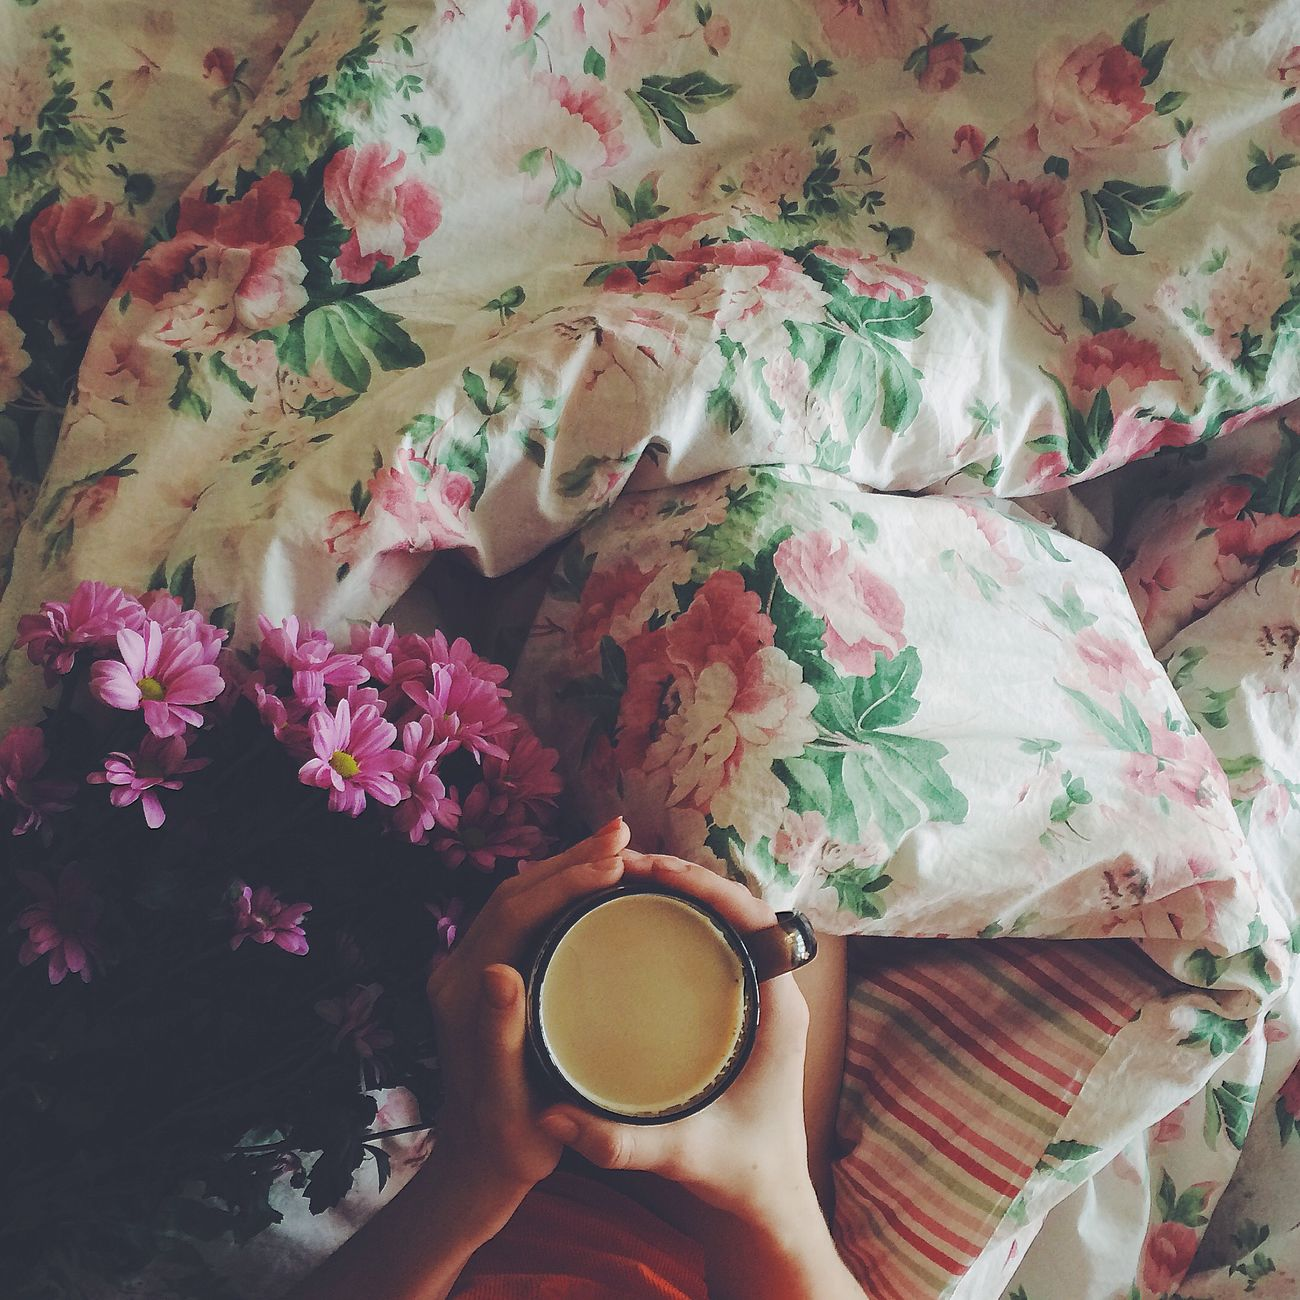 First Eyeem Photo Coffee Breakfast Evening Россия Екатеринбург дома утро вечер Morning